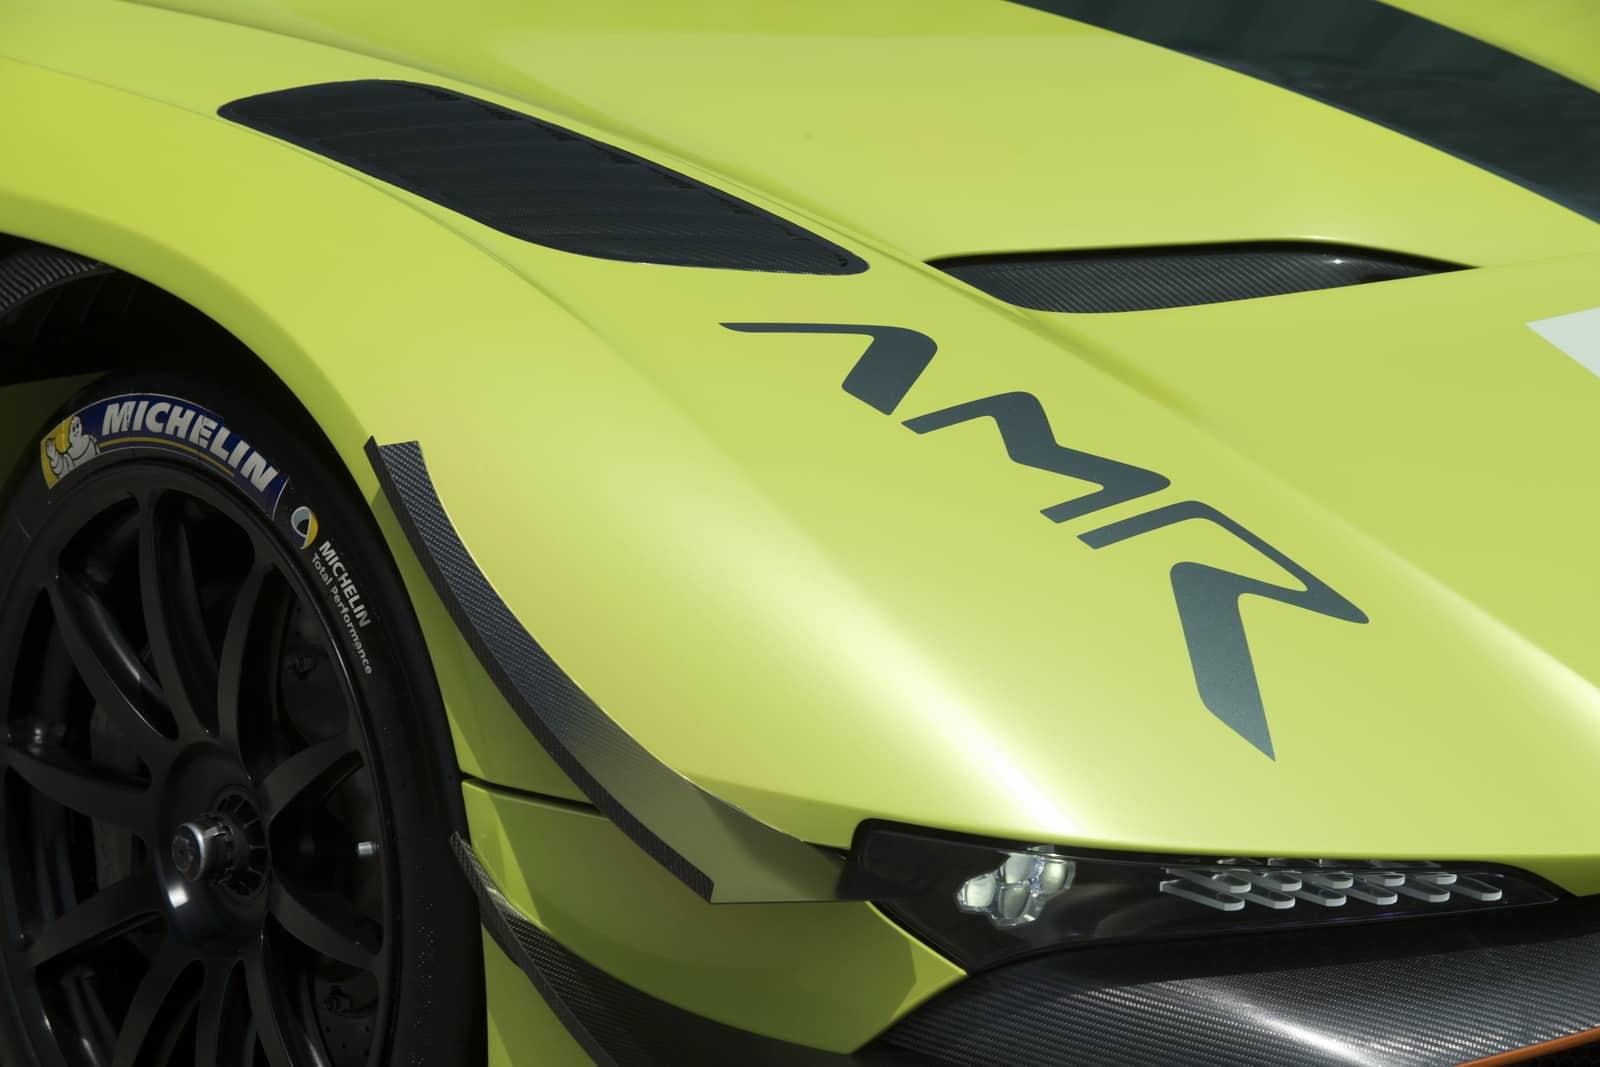 Aston Martin Vulcan AMR PRO 13